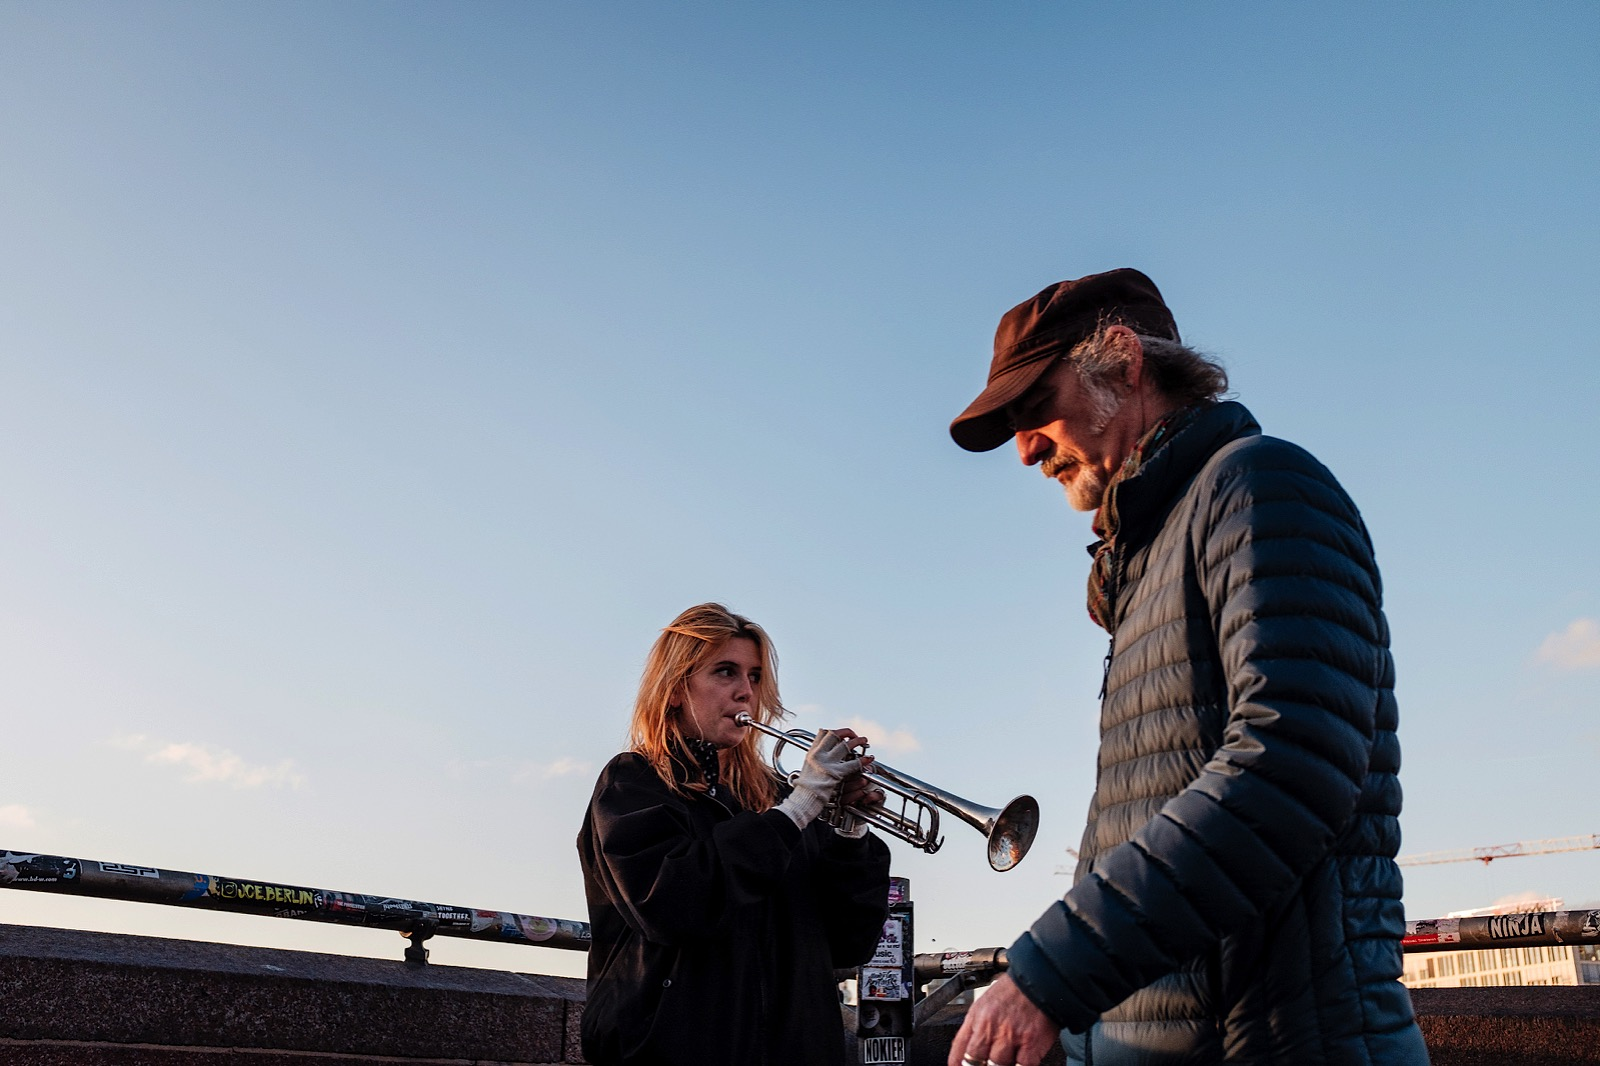 Girl playing trumpet in Berlin